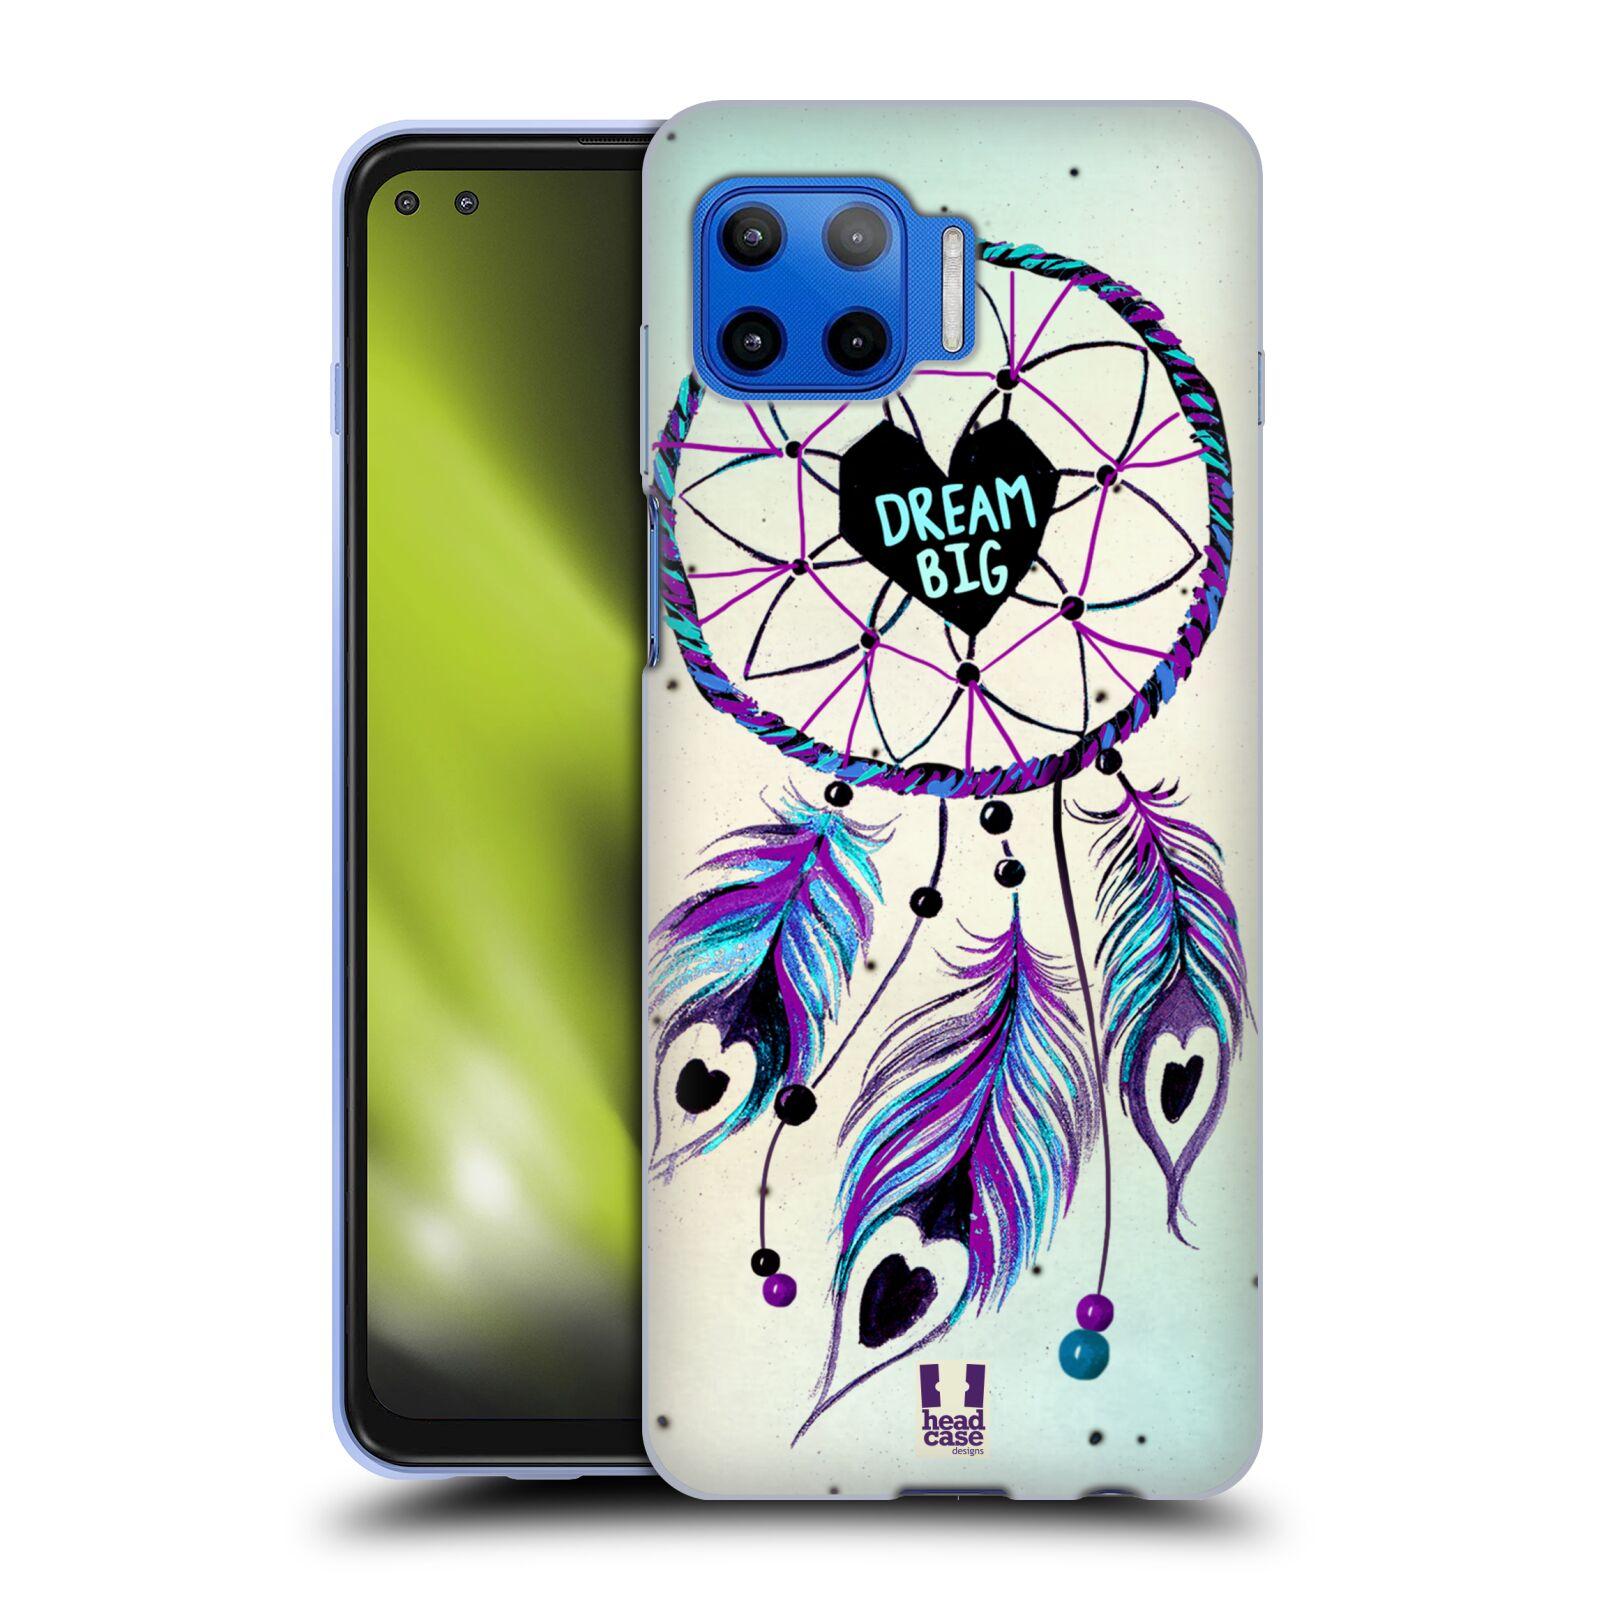 Silikonové pouzdro na mobil Motorola Moto G 5G Plus - Head Case - Lapač Assorted Dream Big Srdce